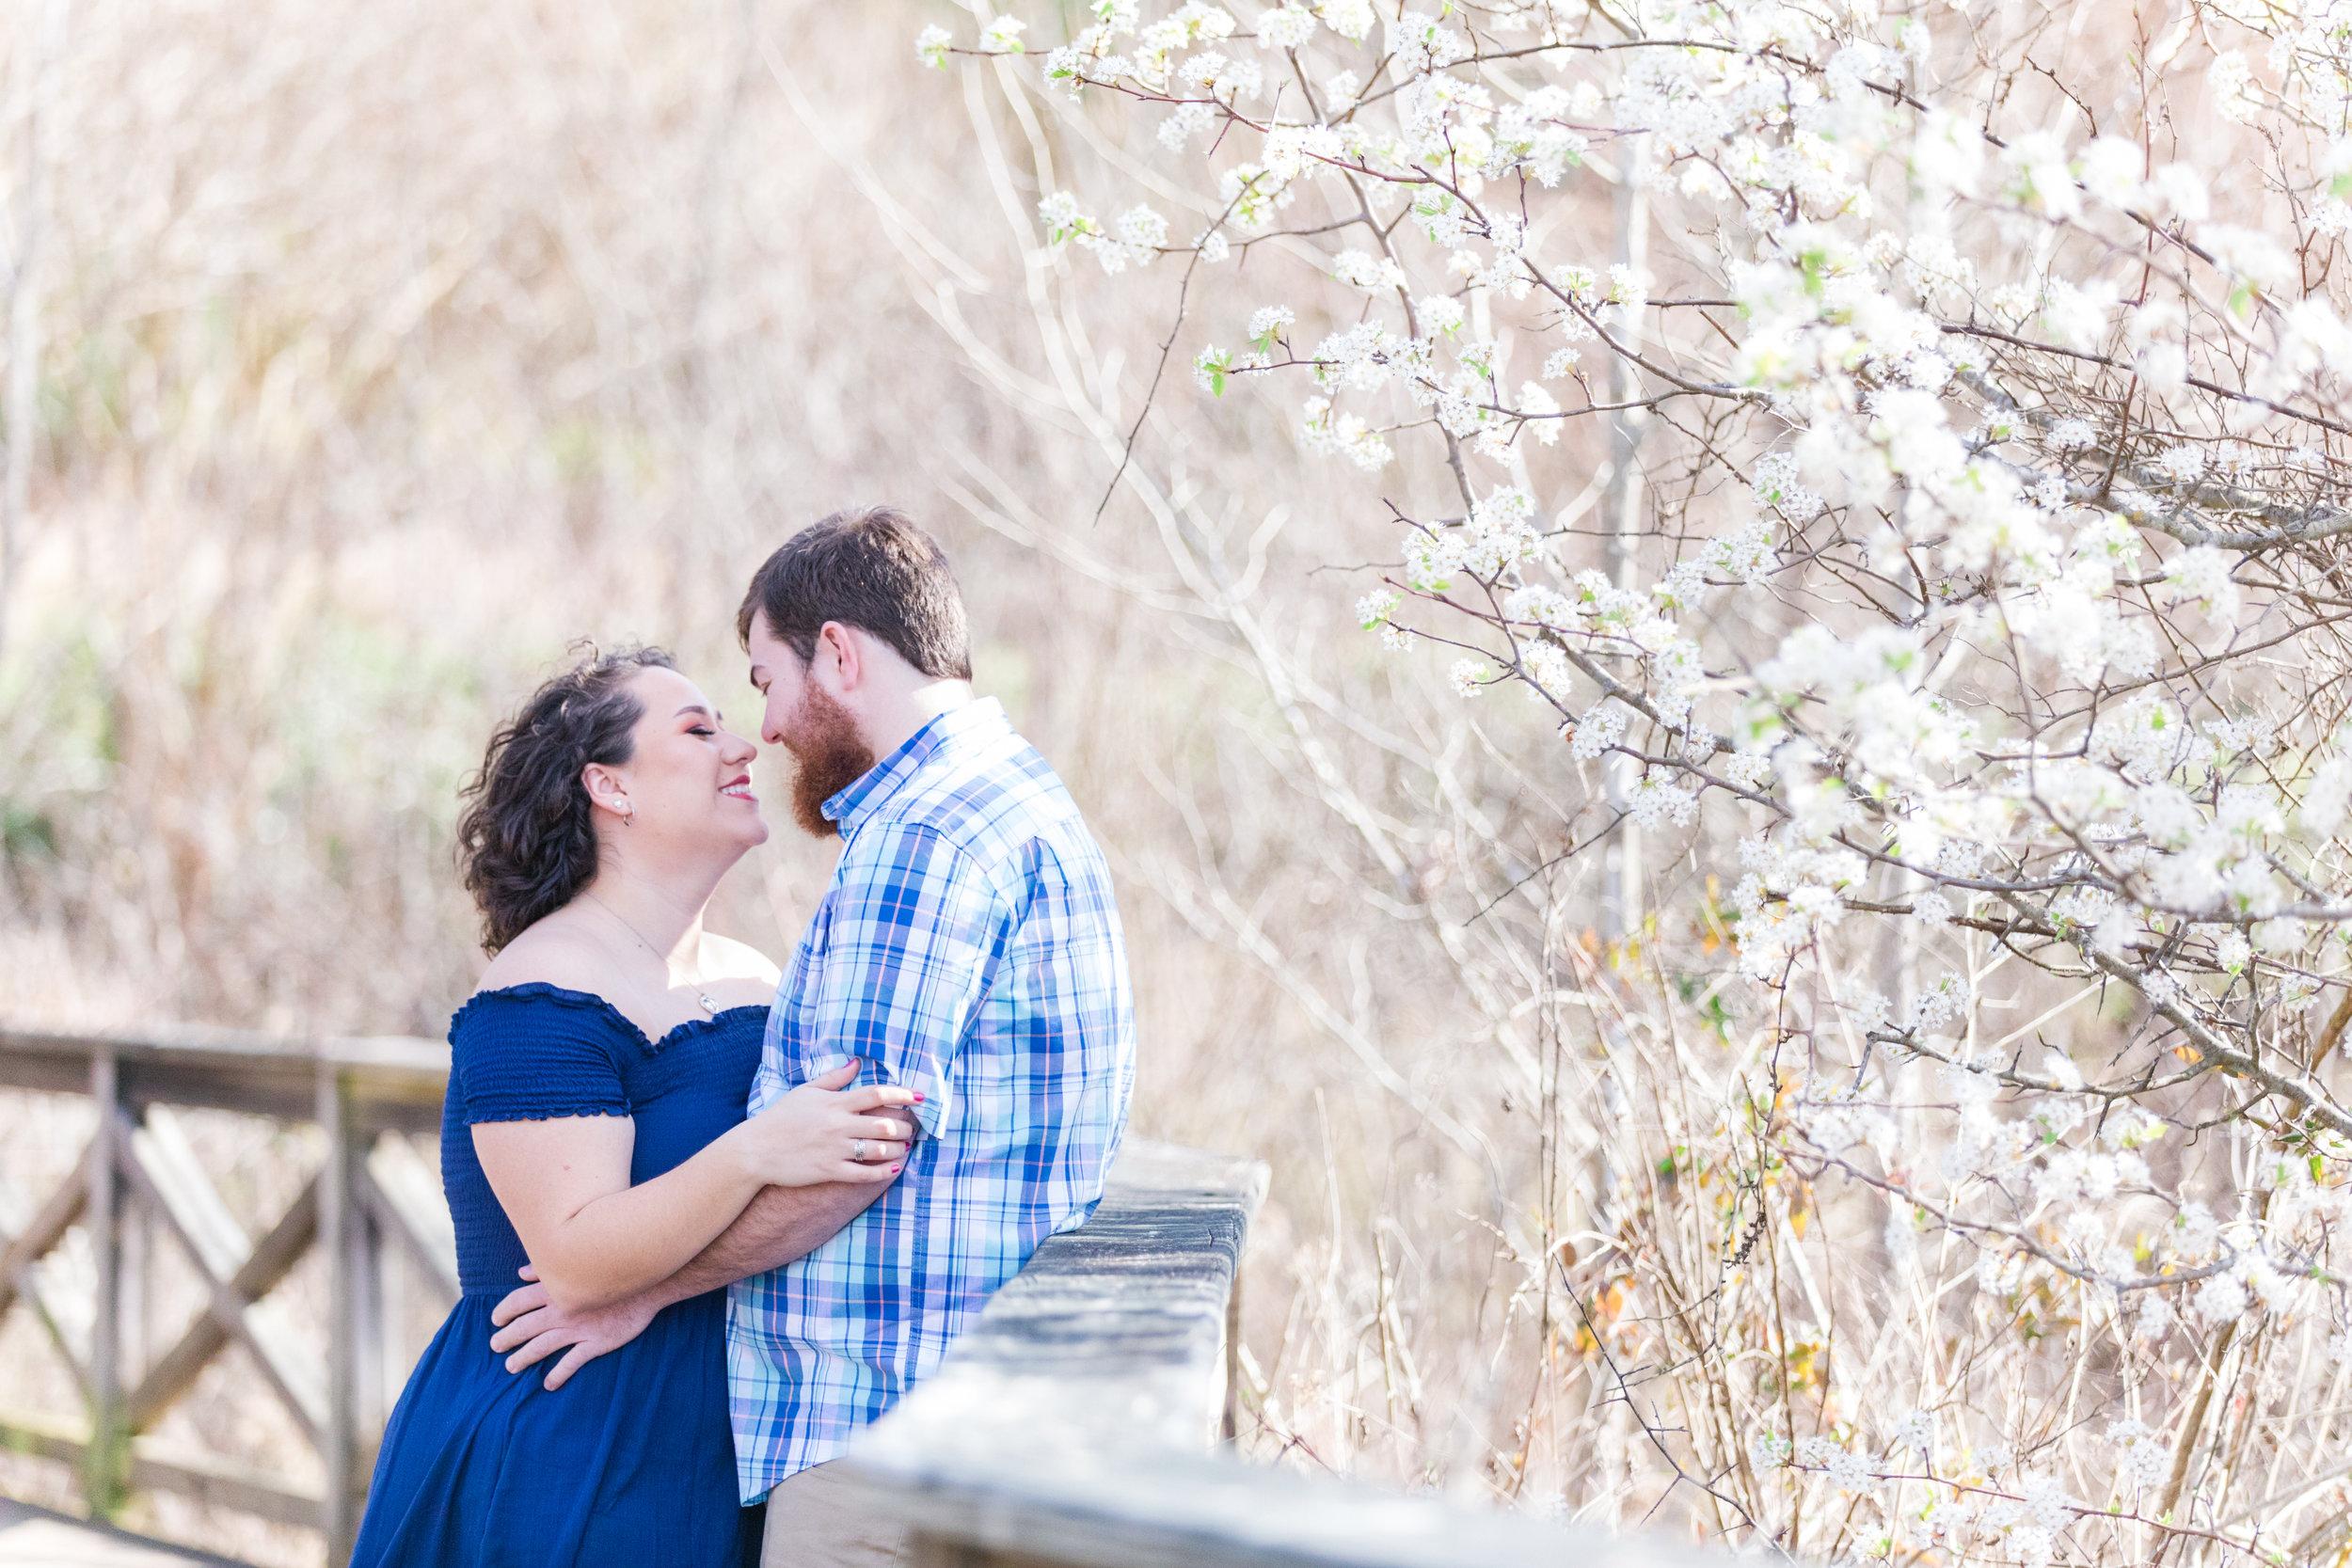 Midlothian Mines Spring Engagement Session - Richmond VA Wedding Photographer - MJ Mendoza Photography